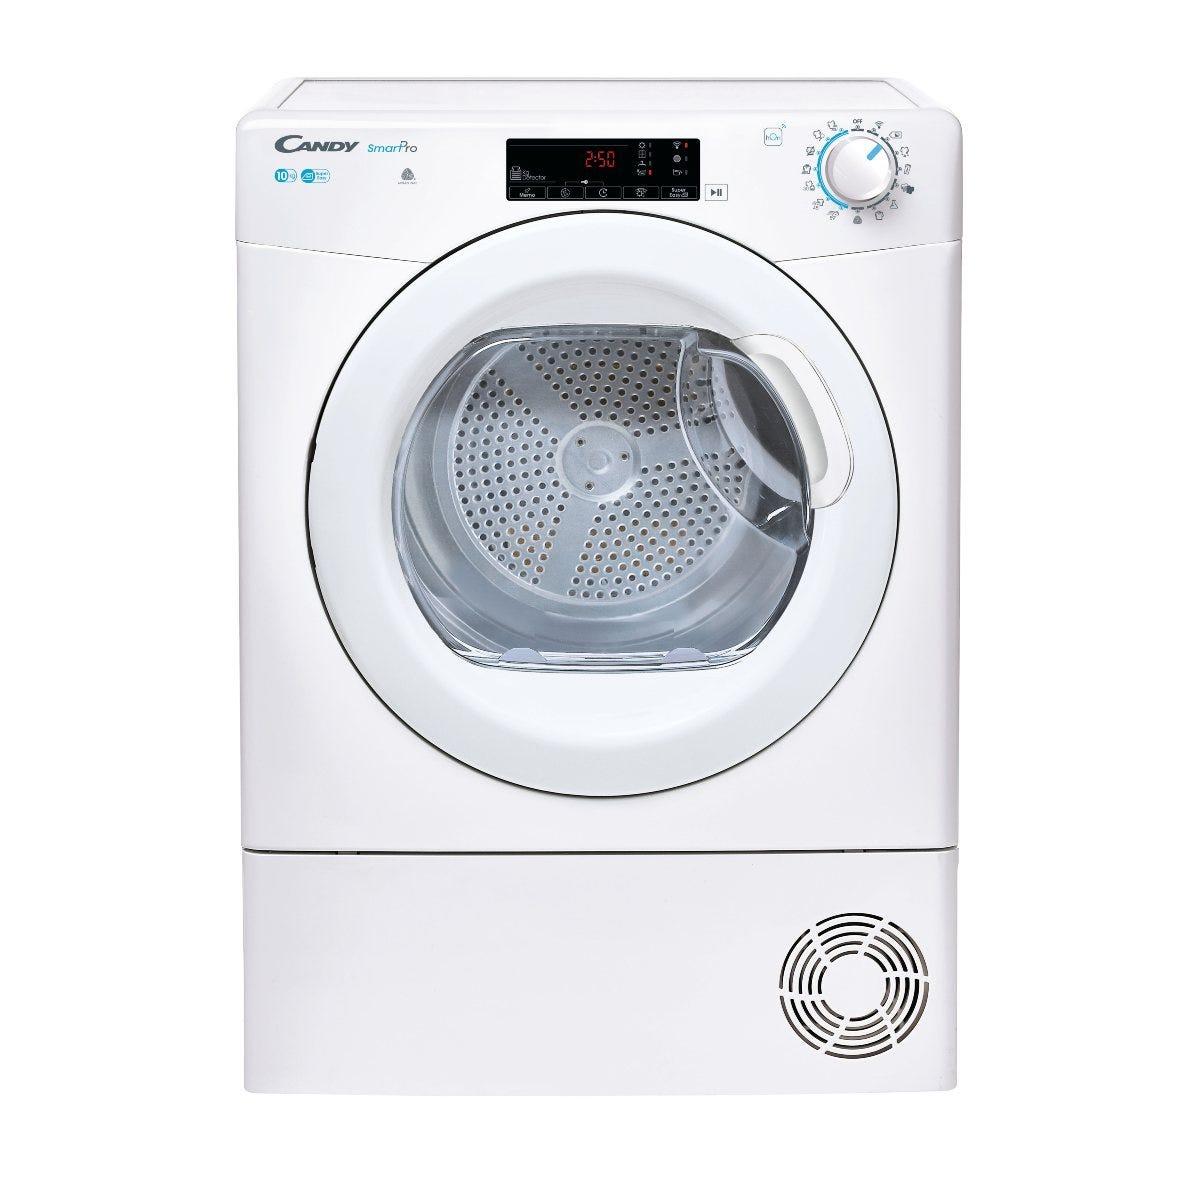 Candy CSOEC10TG-80 Wi-Fi 10kg Condenser Tumble Dryer - White